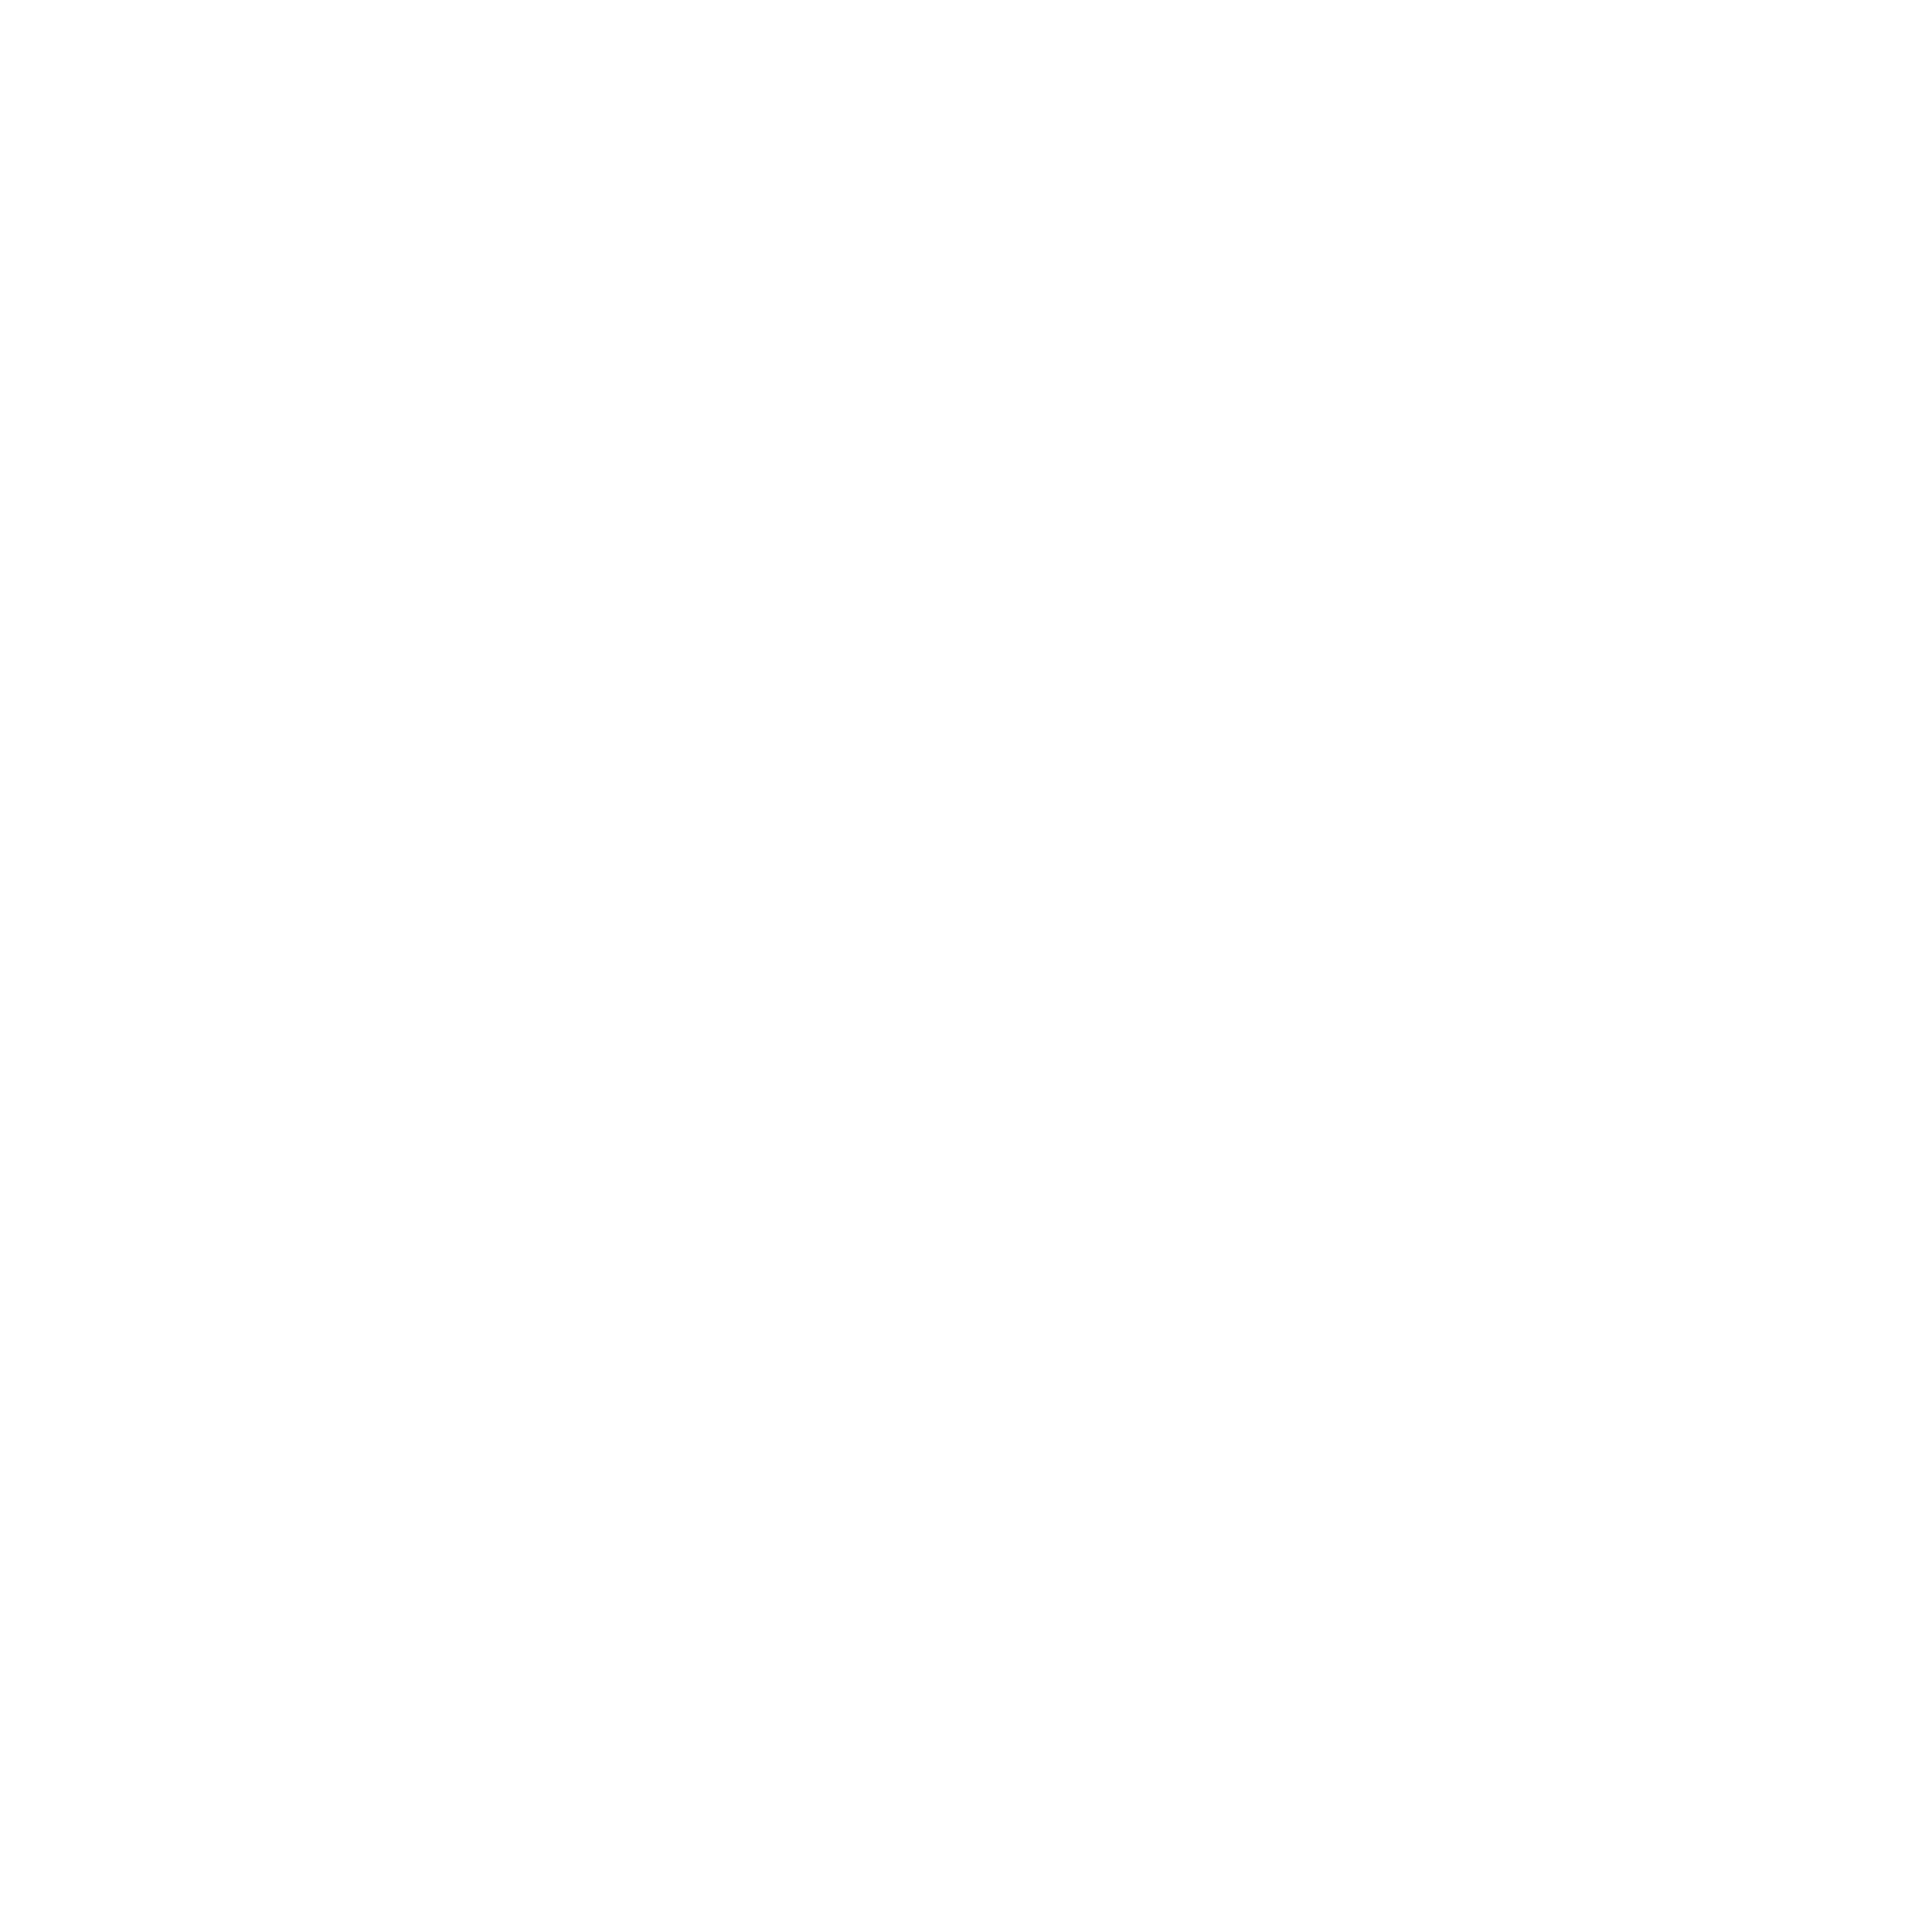 white telegram logo